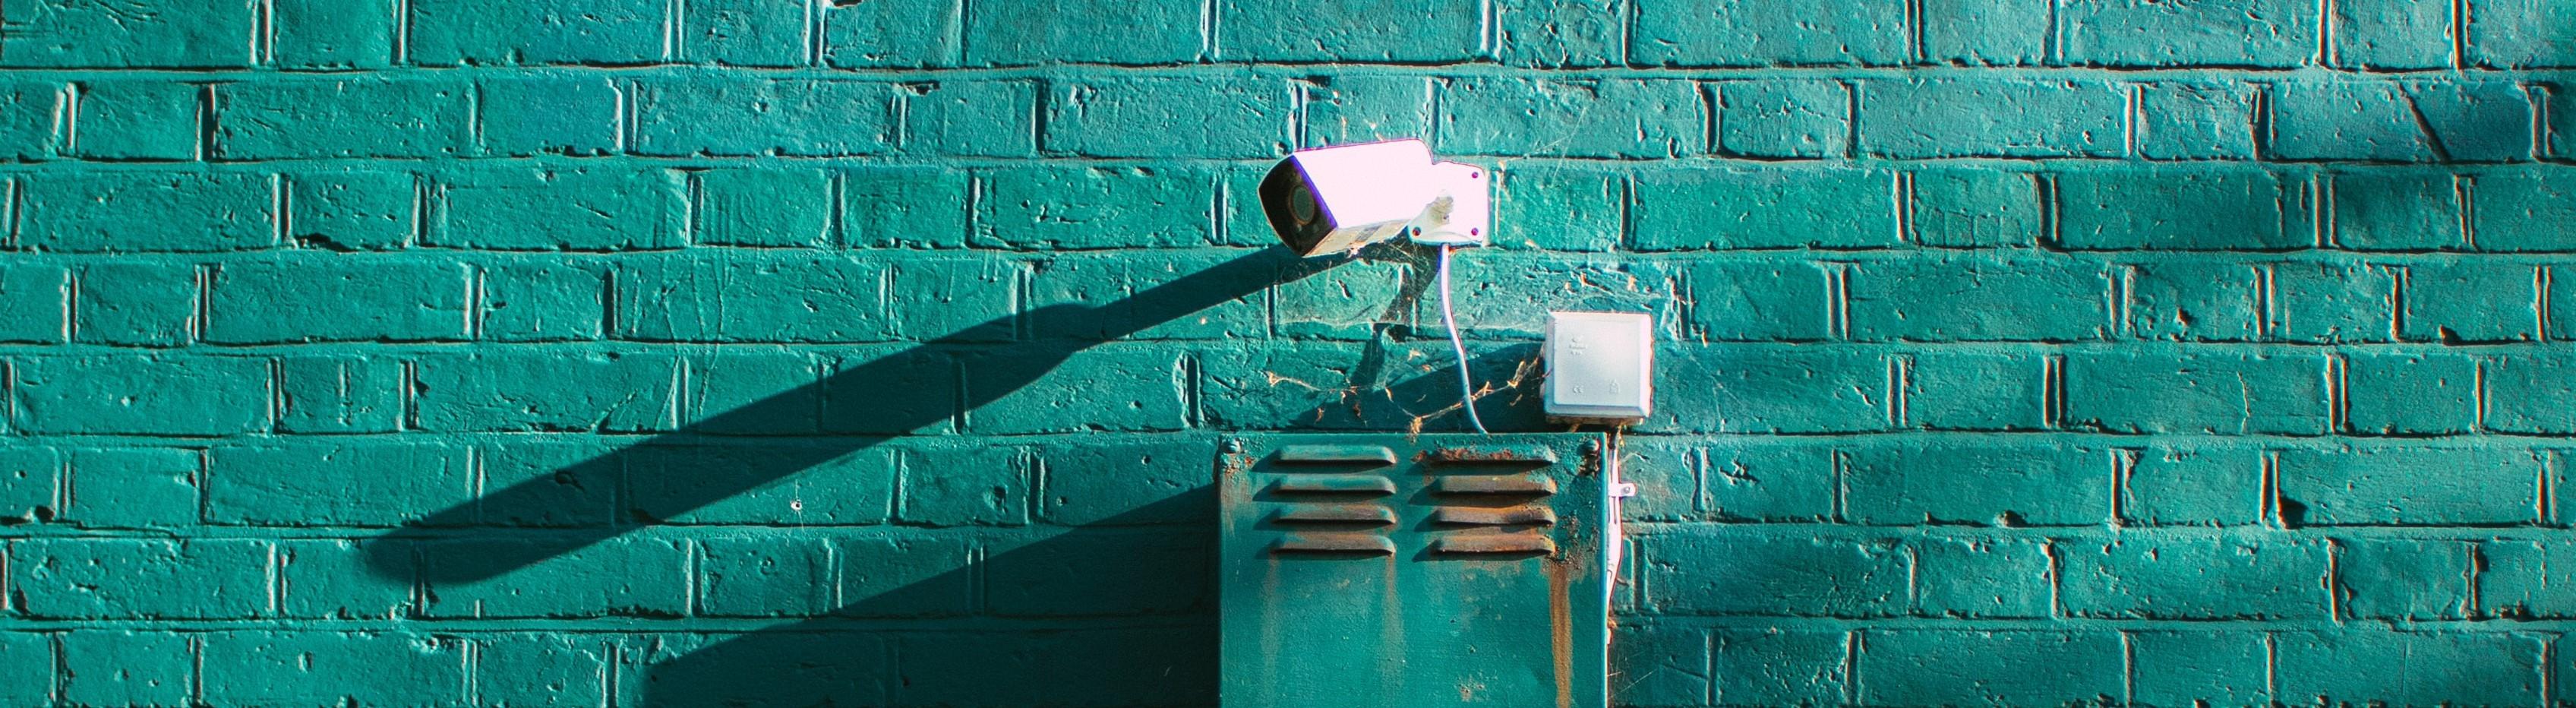 Überwachungskamera hängt an türkiser Wand